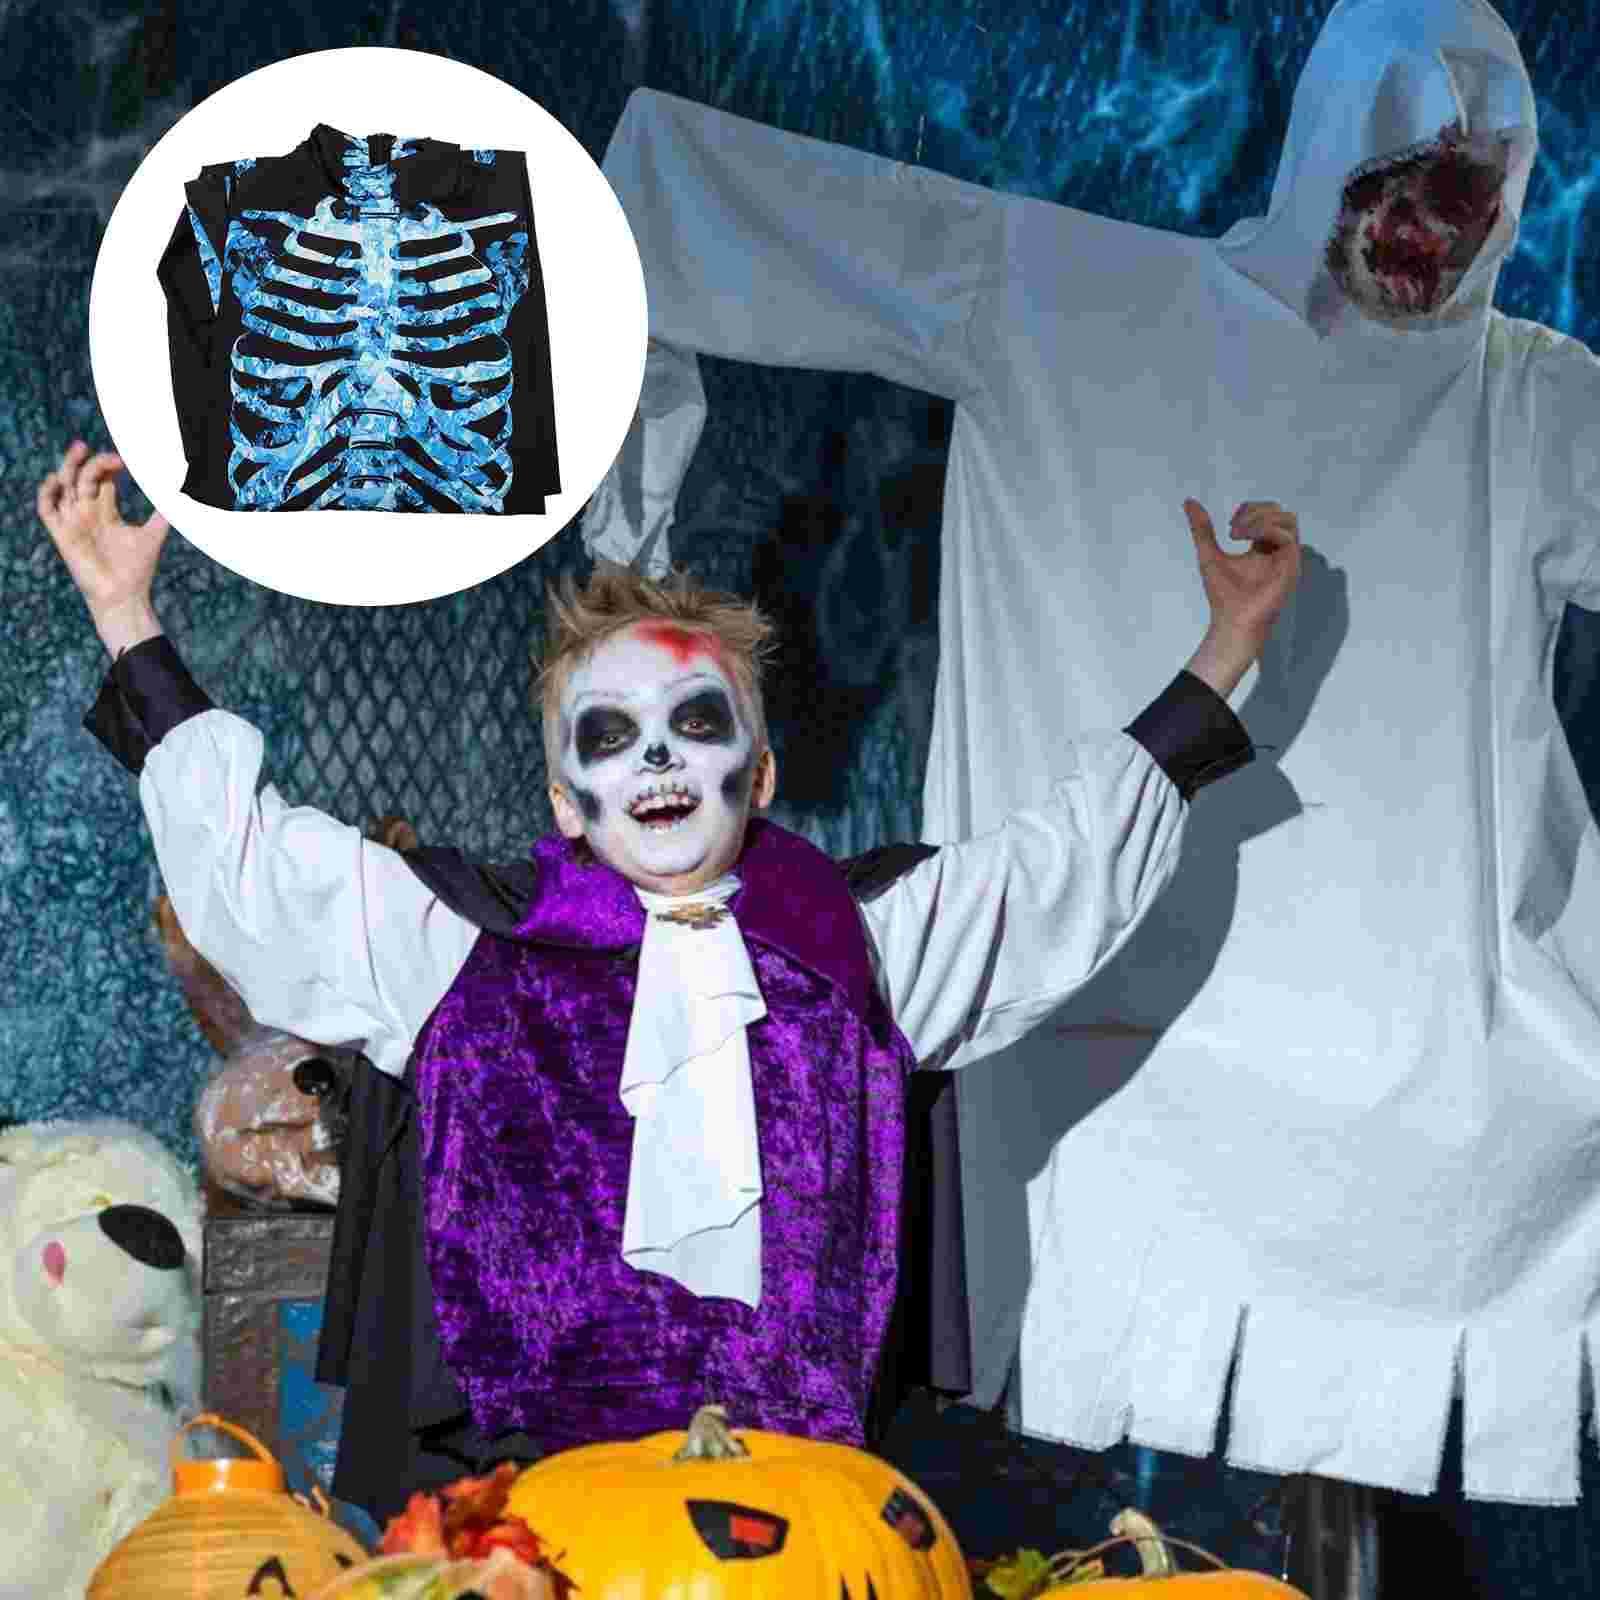 1Pc Skeleton Jumpsuit Cosplay Costume Printed Bodysuit